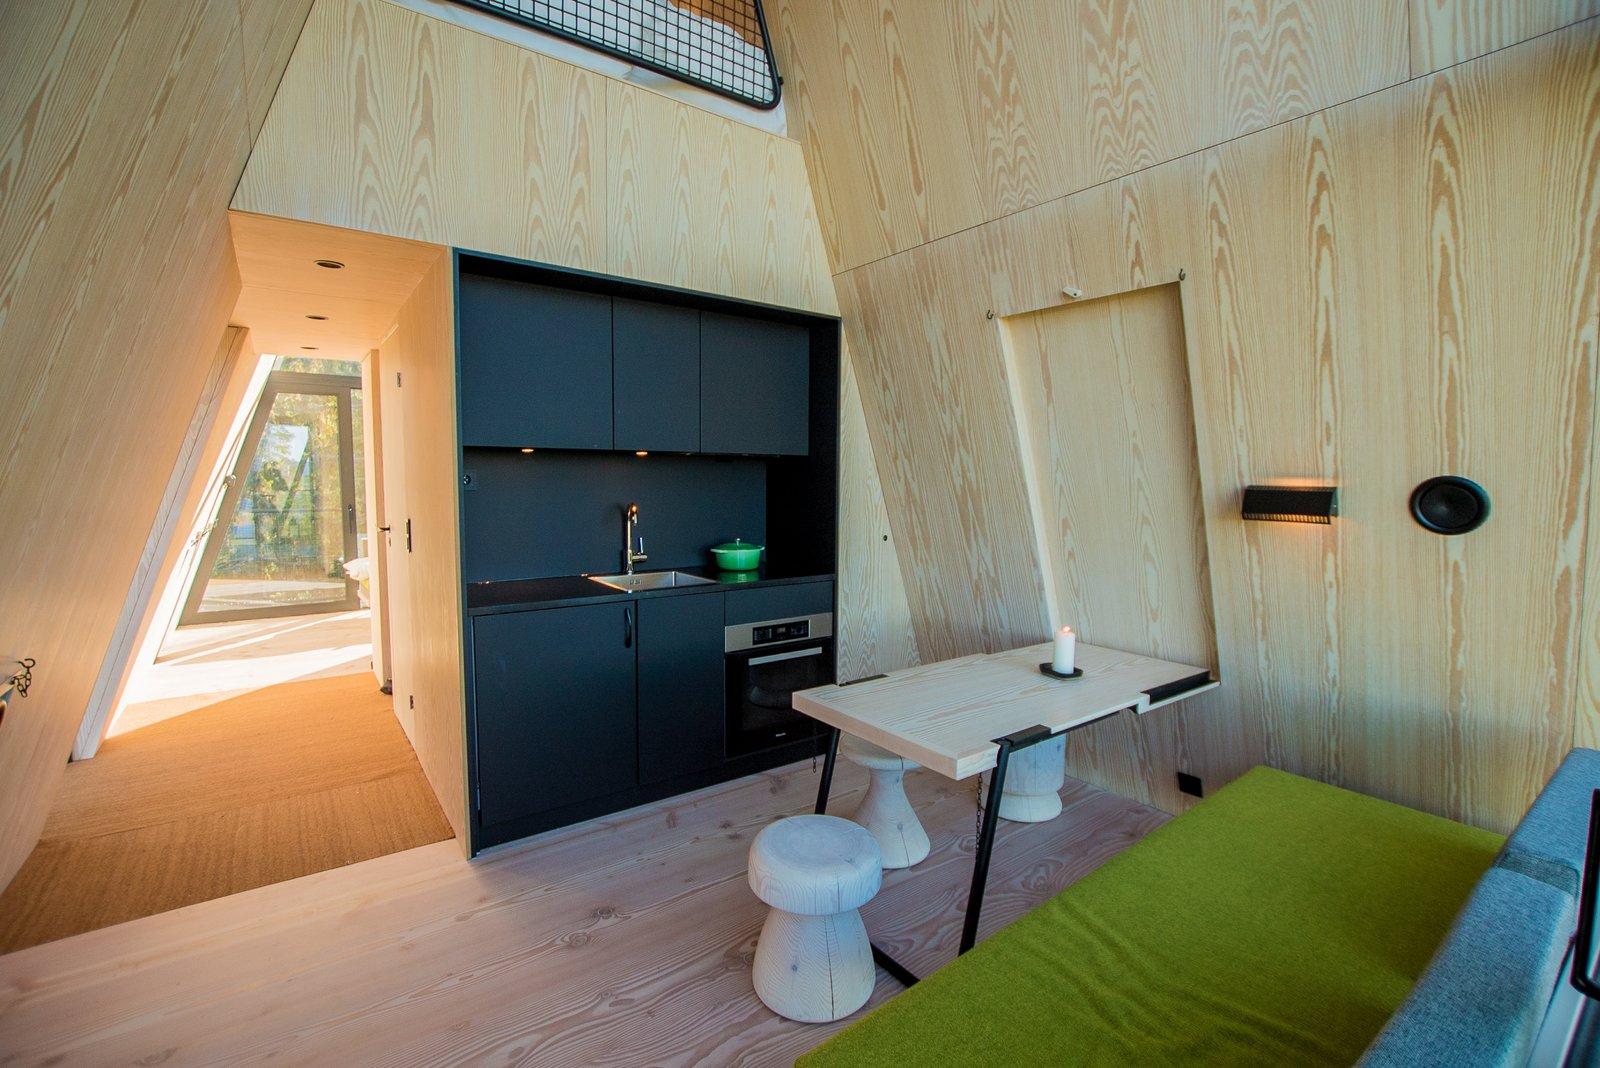 PAN Treetop Cabins by Espen Surnevik